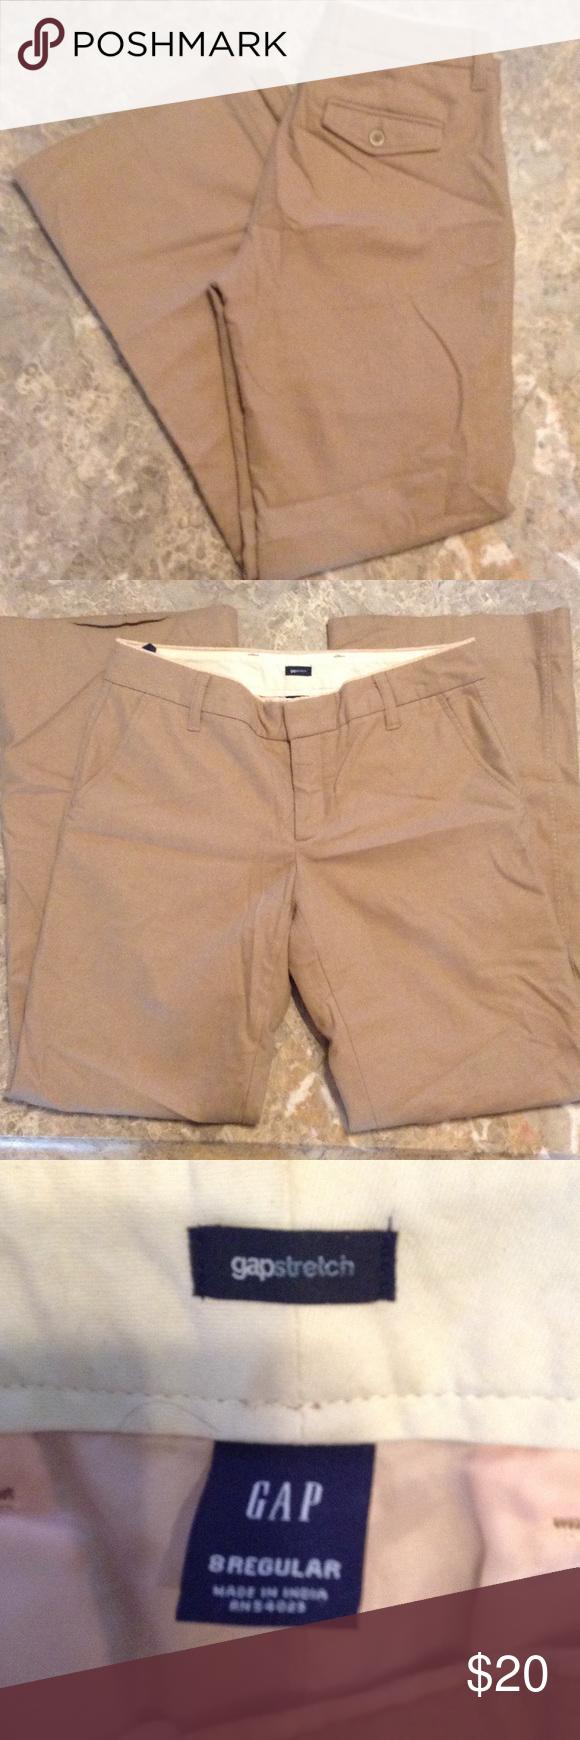 "Khaki GAP stretch wool blend pants sz 8 Nice comfy pants.  Rise 8 1/2"" & inseam 32"".  Bundle 3 or more & save! GAP Pants"